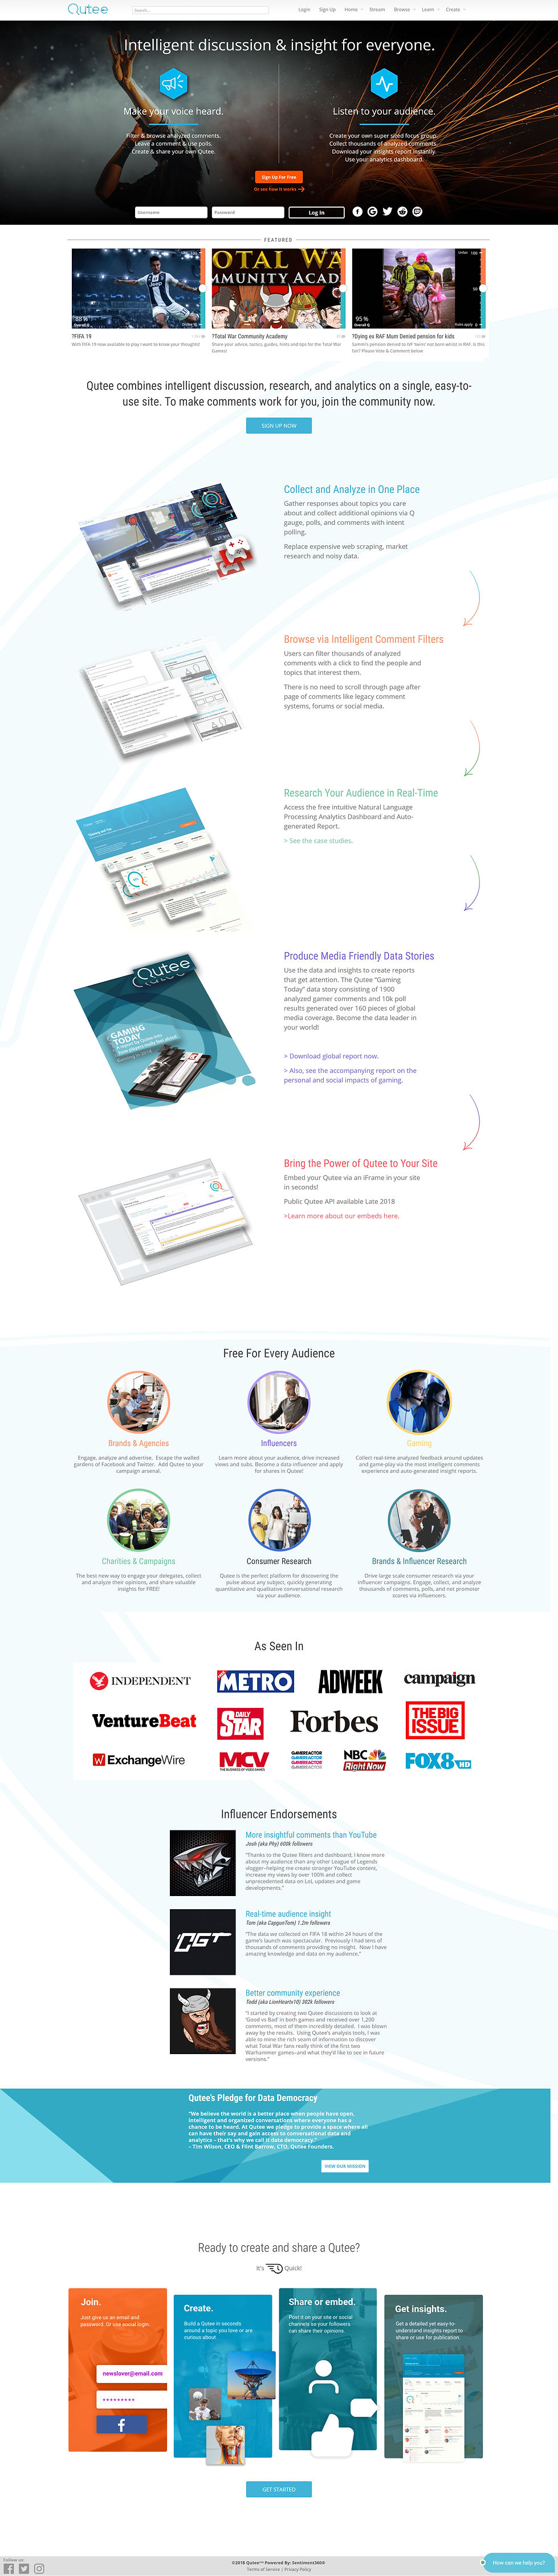 homepage screencap-min.png